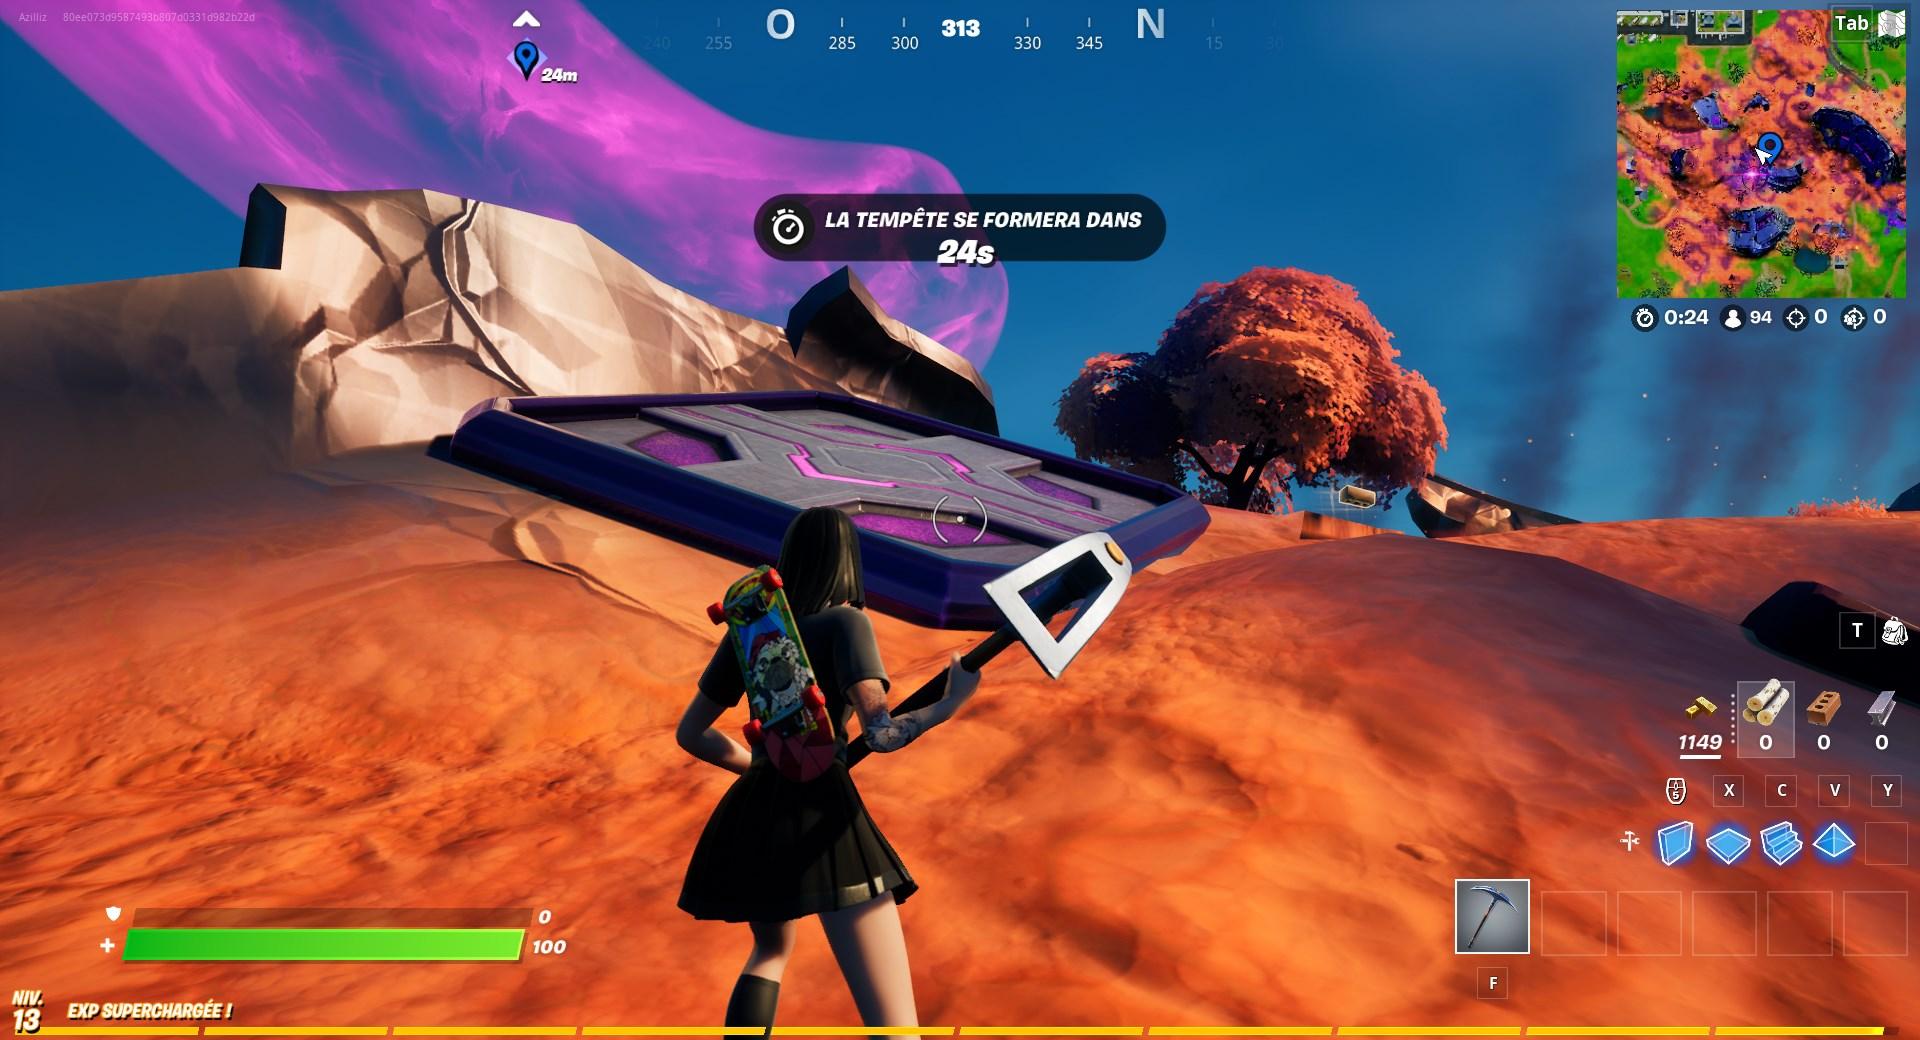 tremplin-extraterrestre-fortnite-site-crash-2